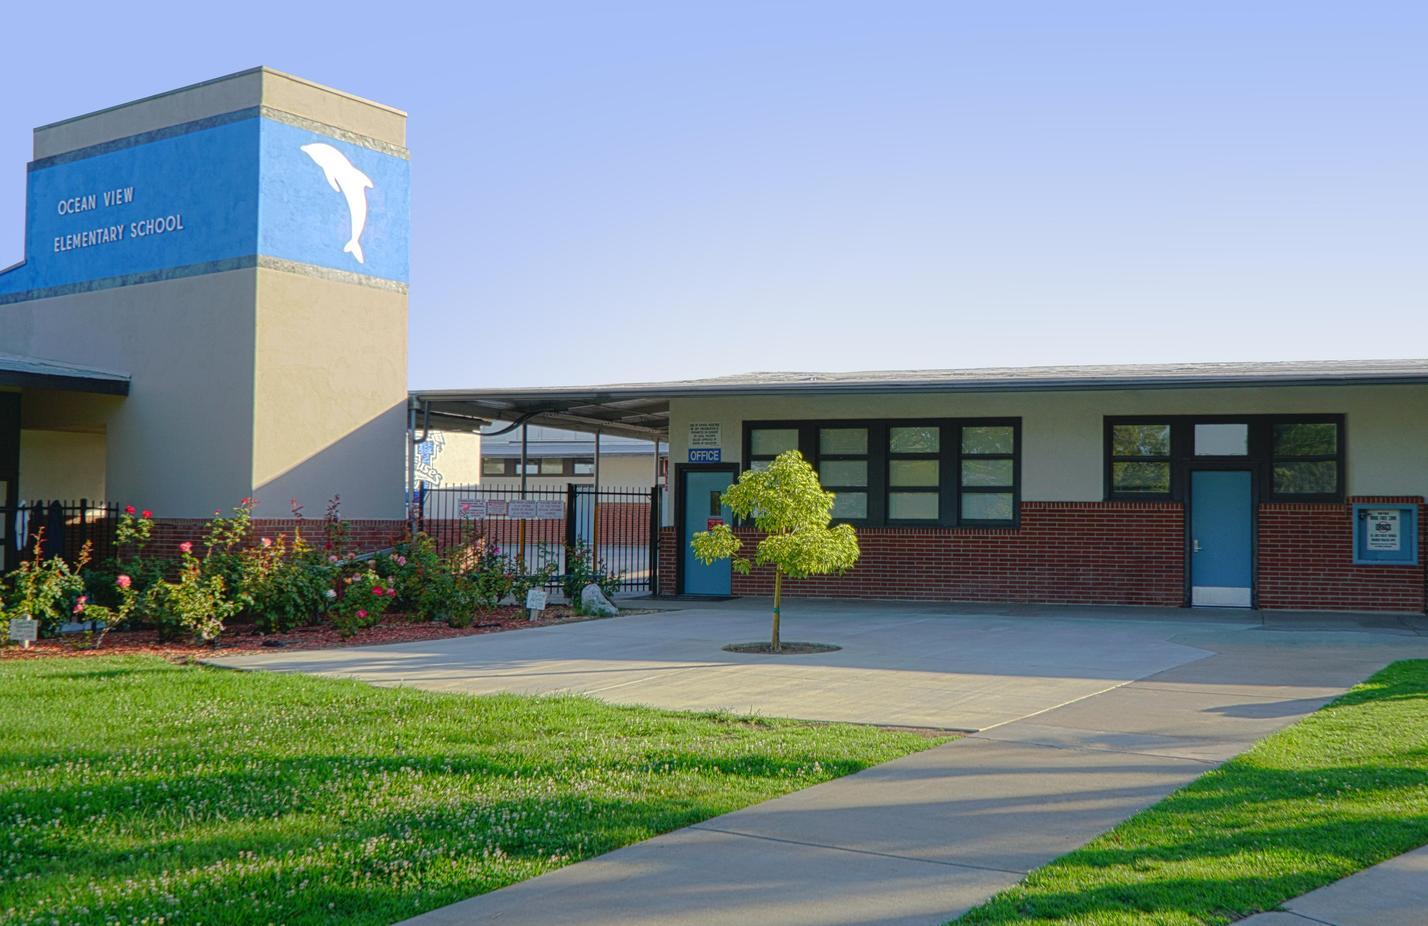 Ocean View Elementary School